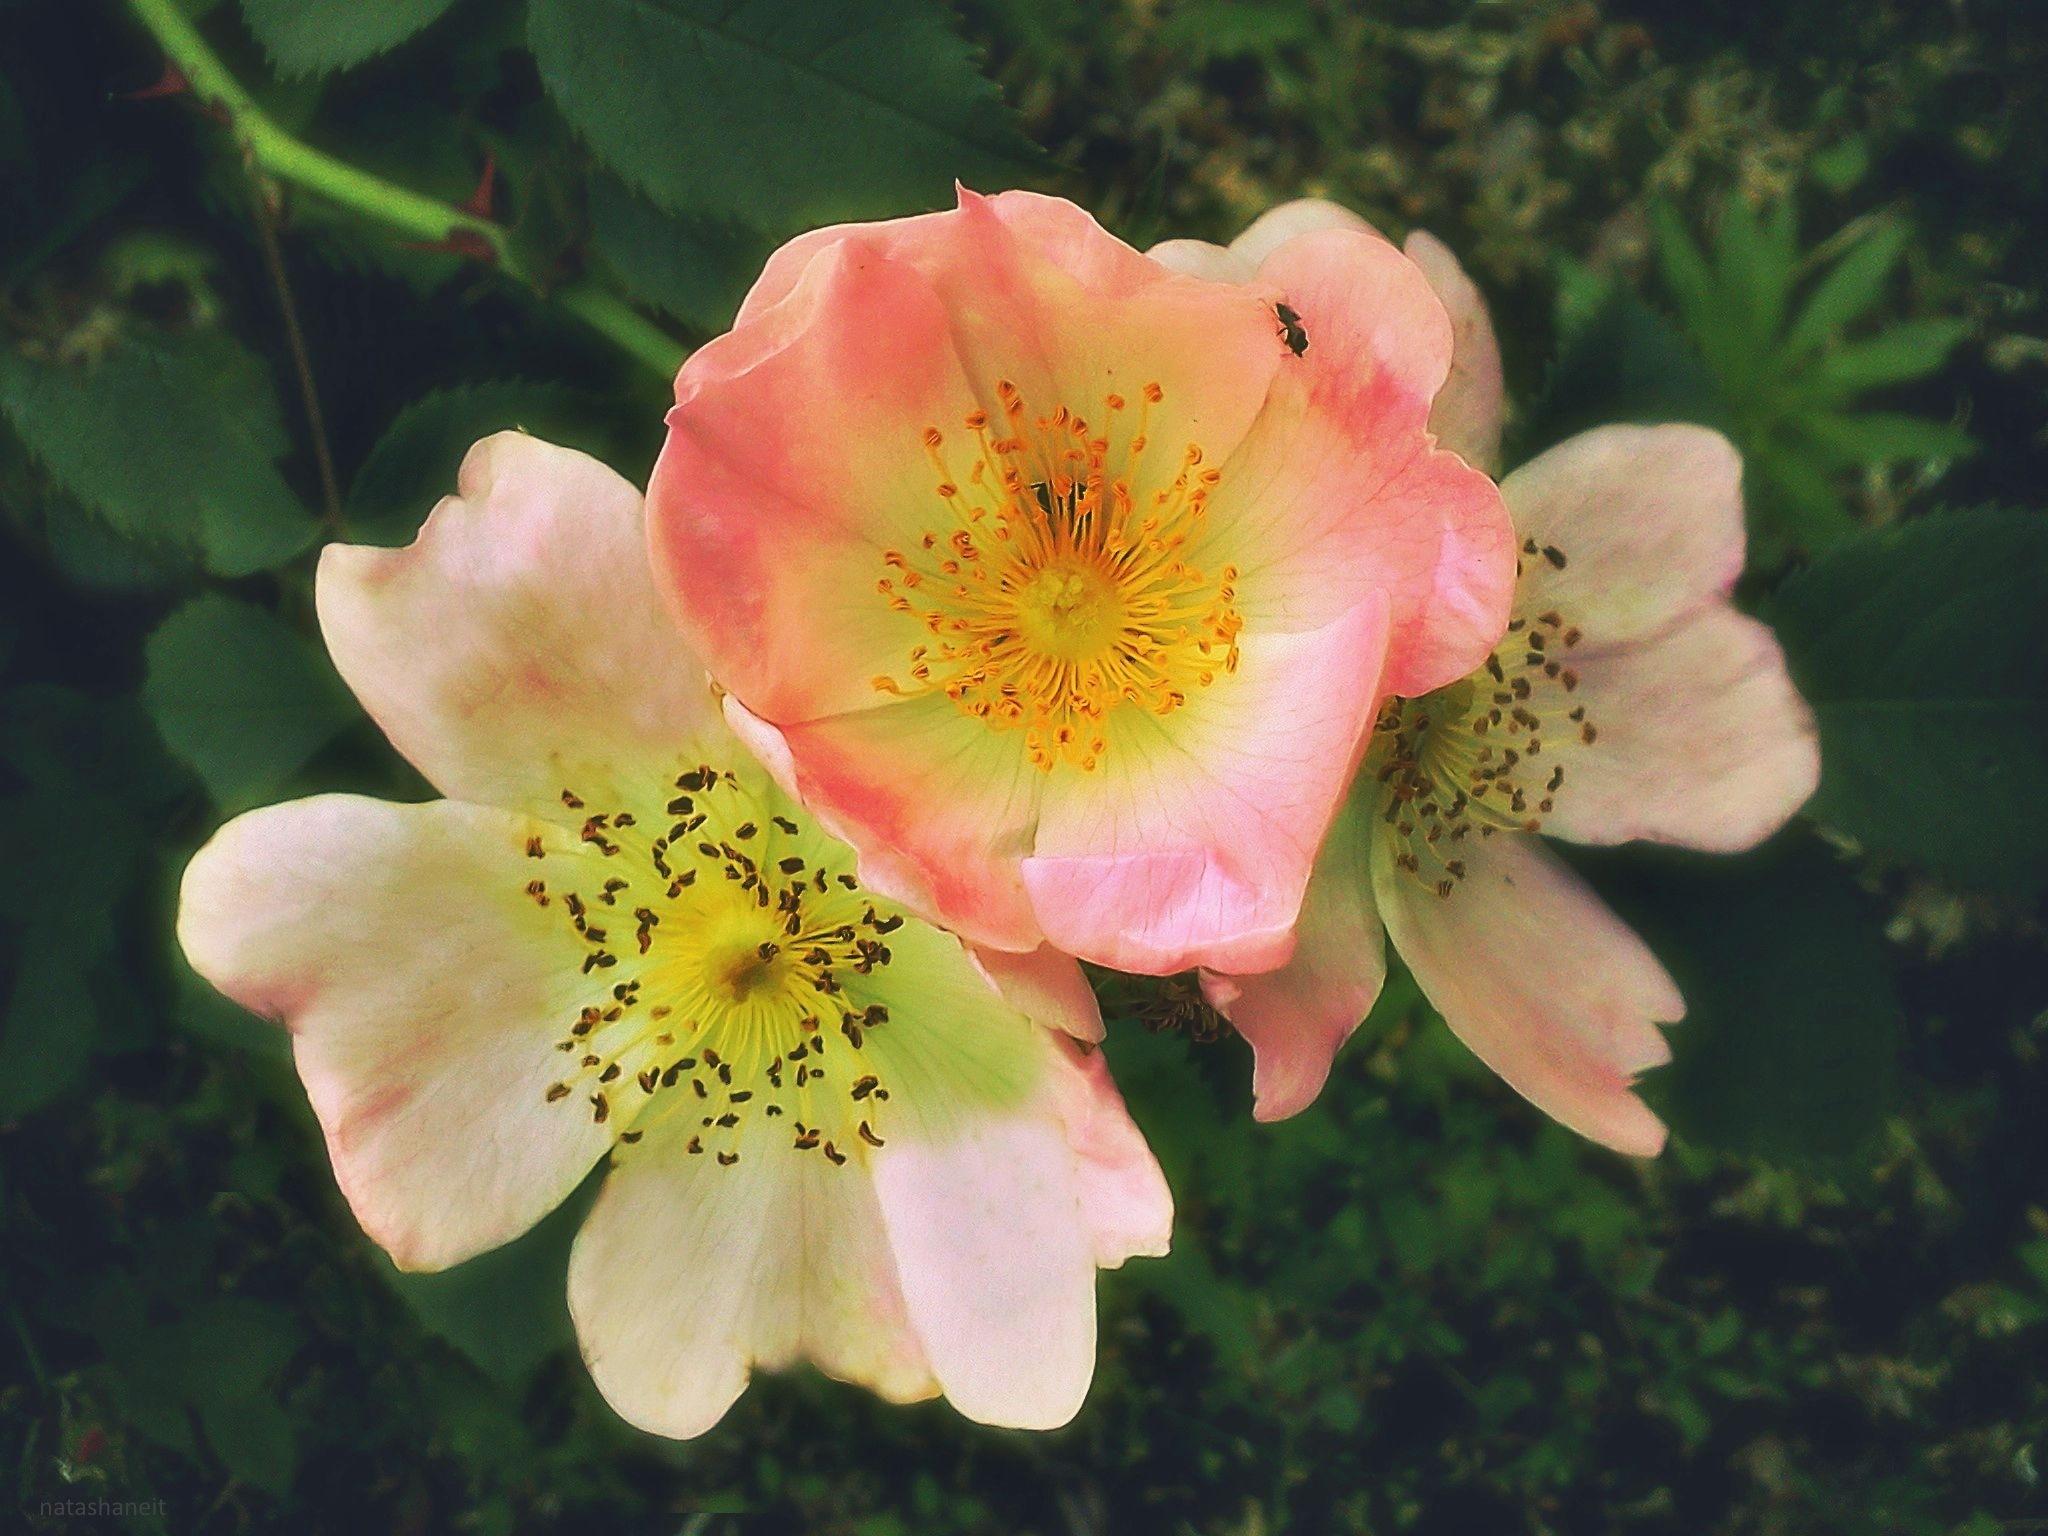 Blooming dog rose by natashaneit